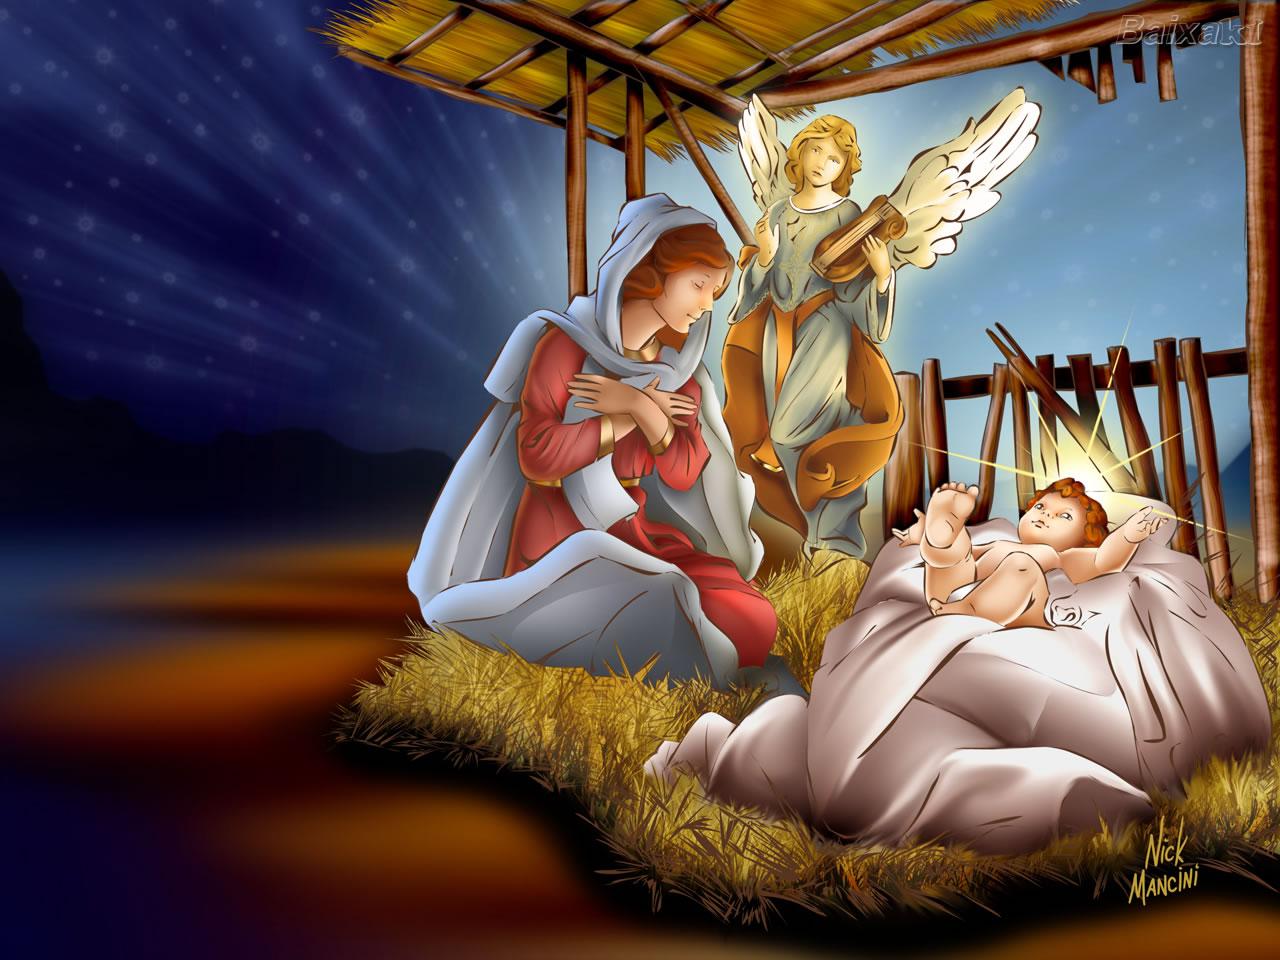 http://2.bp.blogspot.com/-gV-piiJbIwI/TuAVNyzzT-I/AAAAAAAADLU/1_mtQdard1k/s1600/papel-de-parede-natal-menino-Jesus.jpg